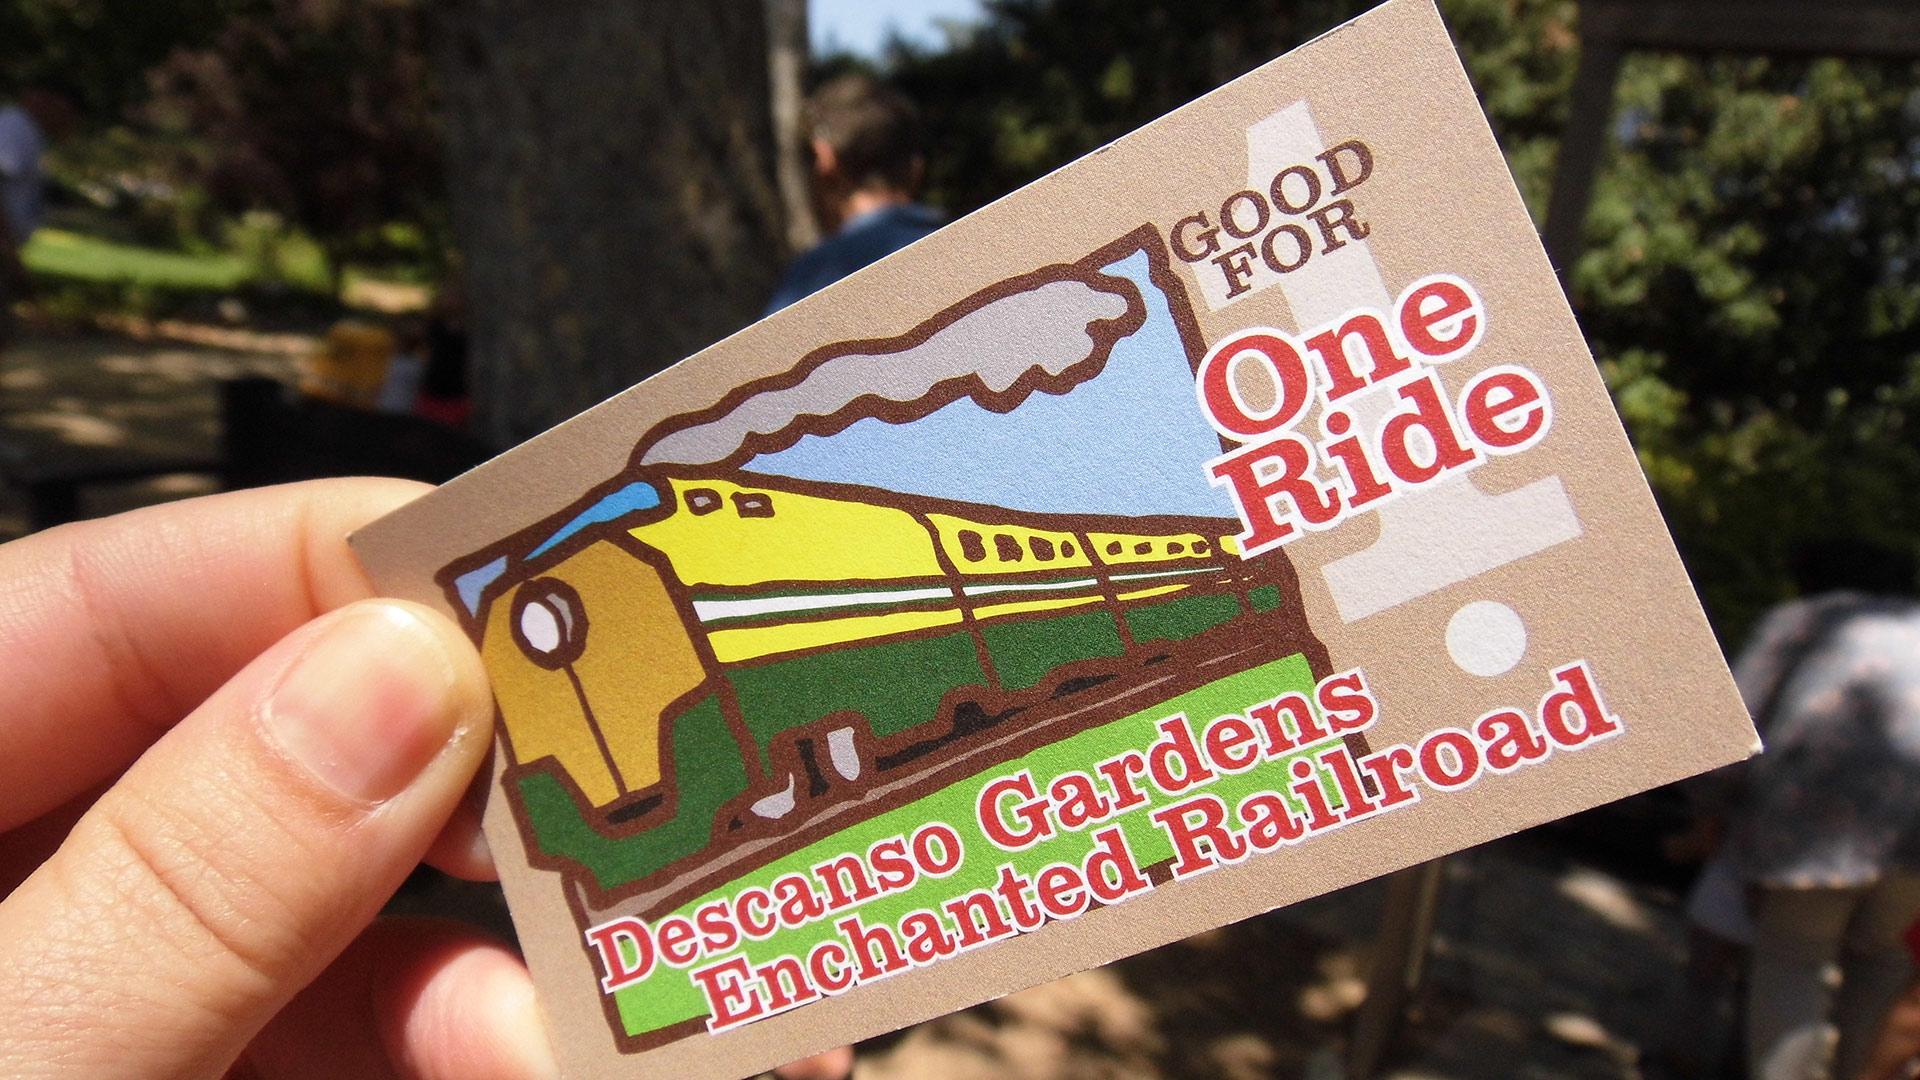 Enchanted Railroad